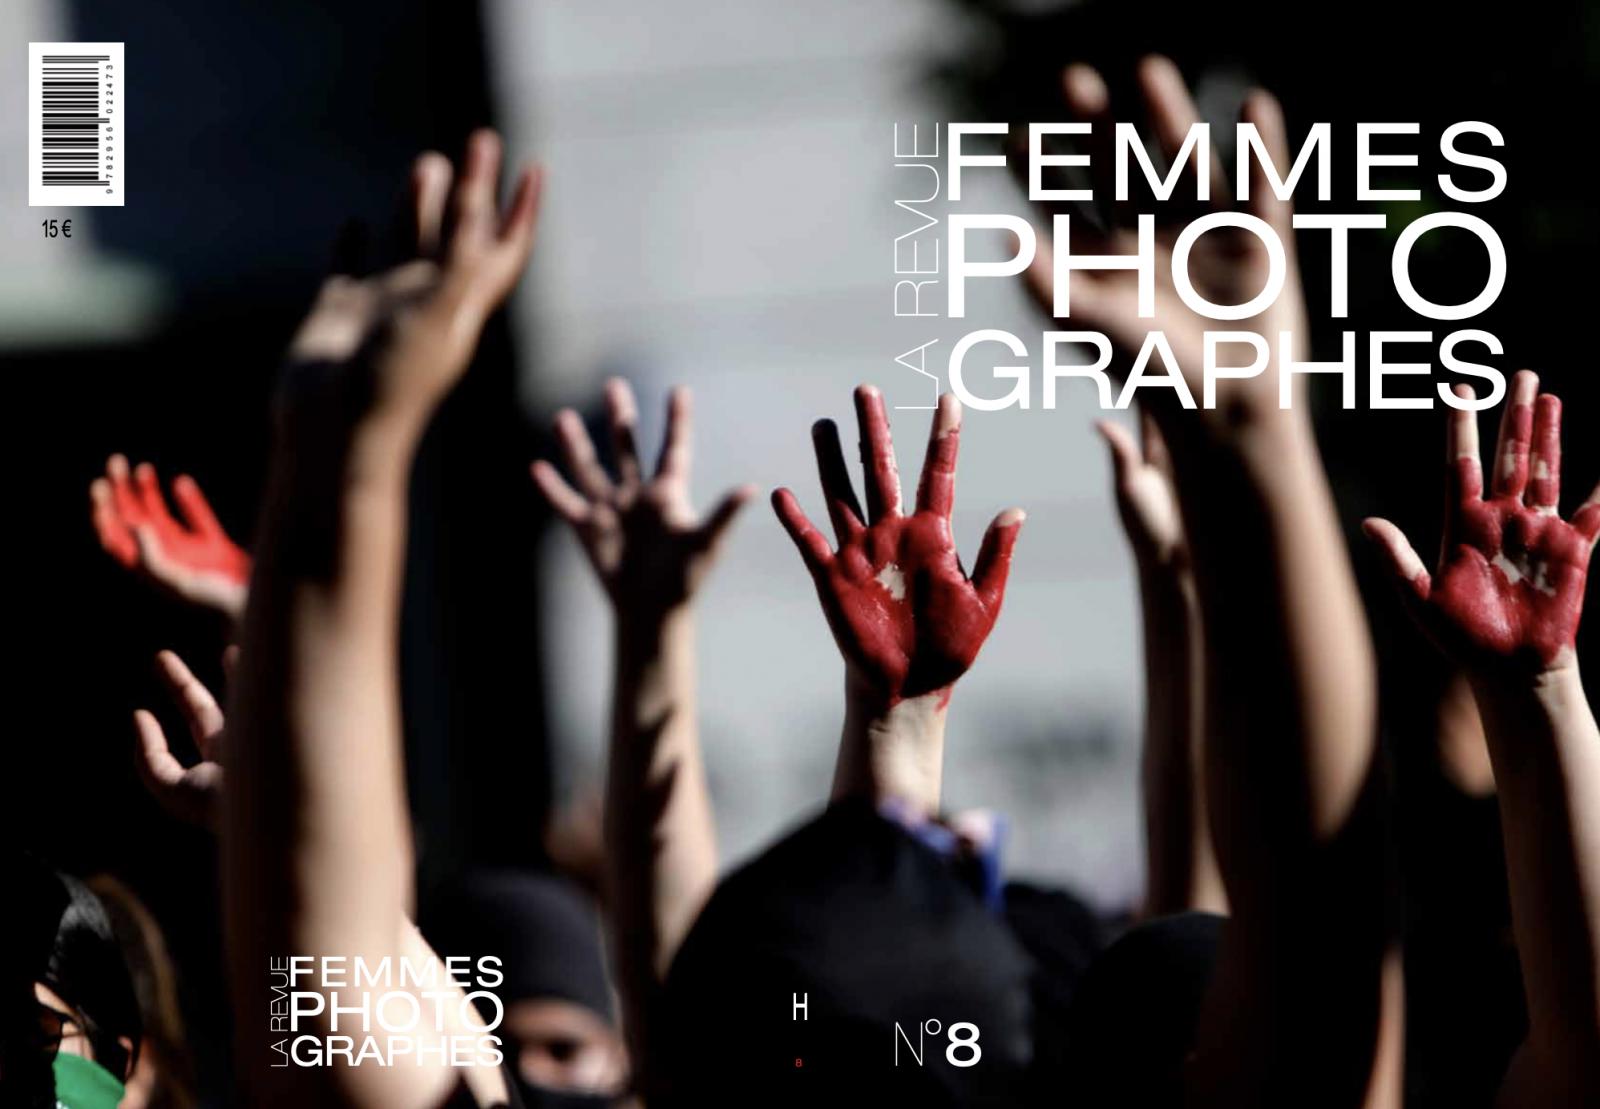 Photography image - Loading Captura_de_Pantalla_2020-09-27_a_la(s)_13.12.01.png